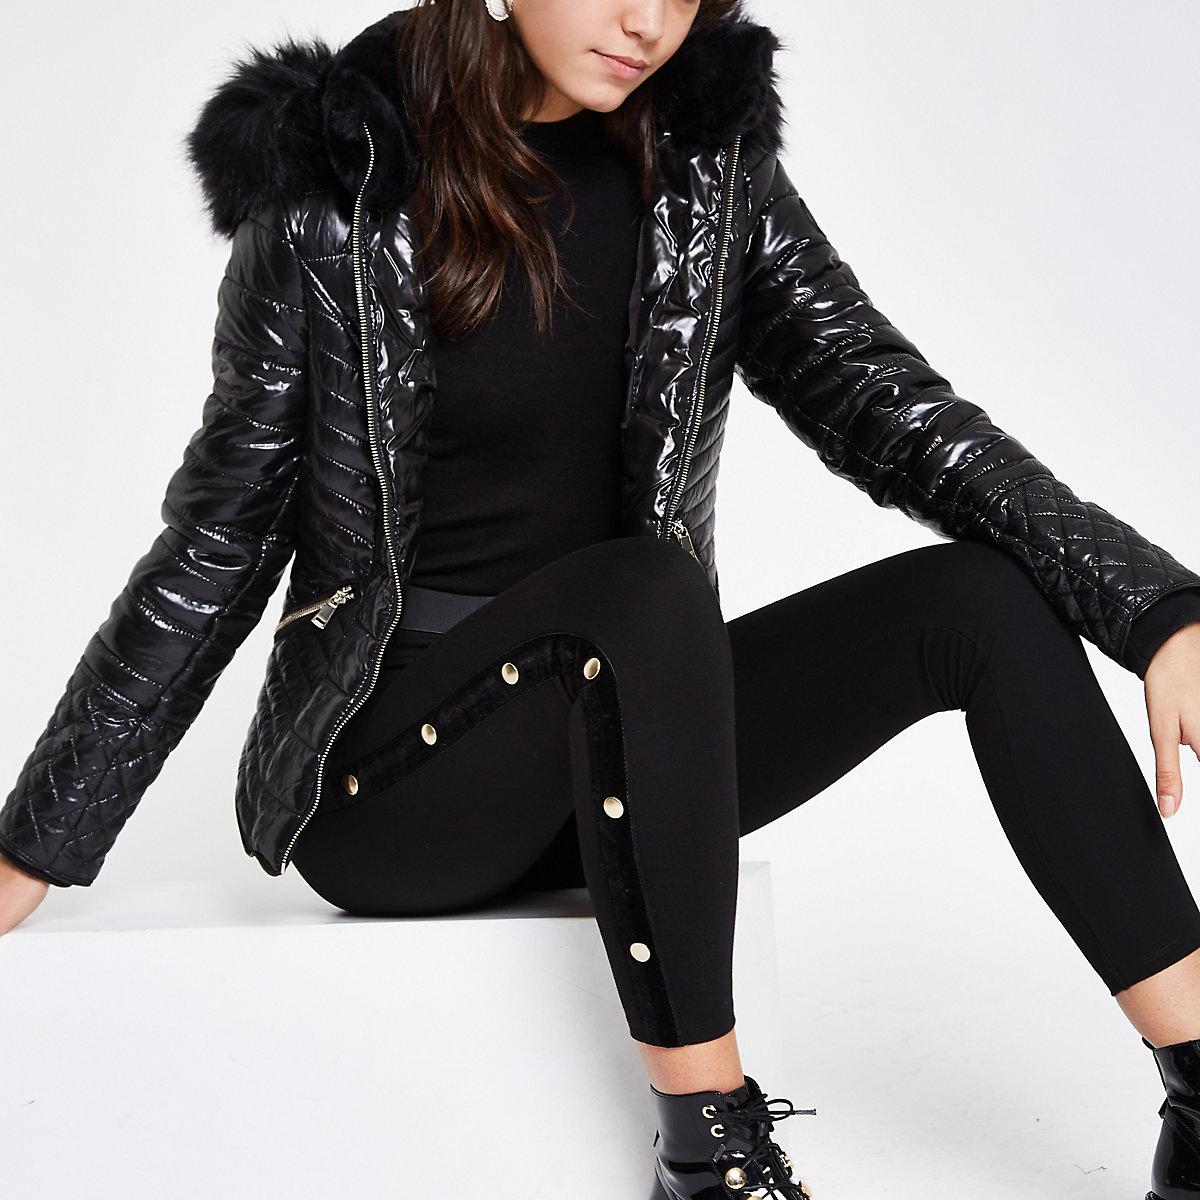 3806281baf4 Black high shine faux fur trim padded jacket - Jackets - Coats   Jackets -  women